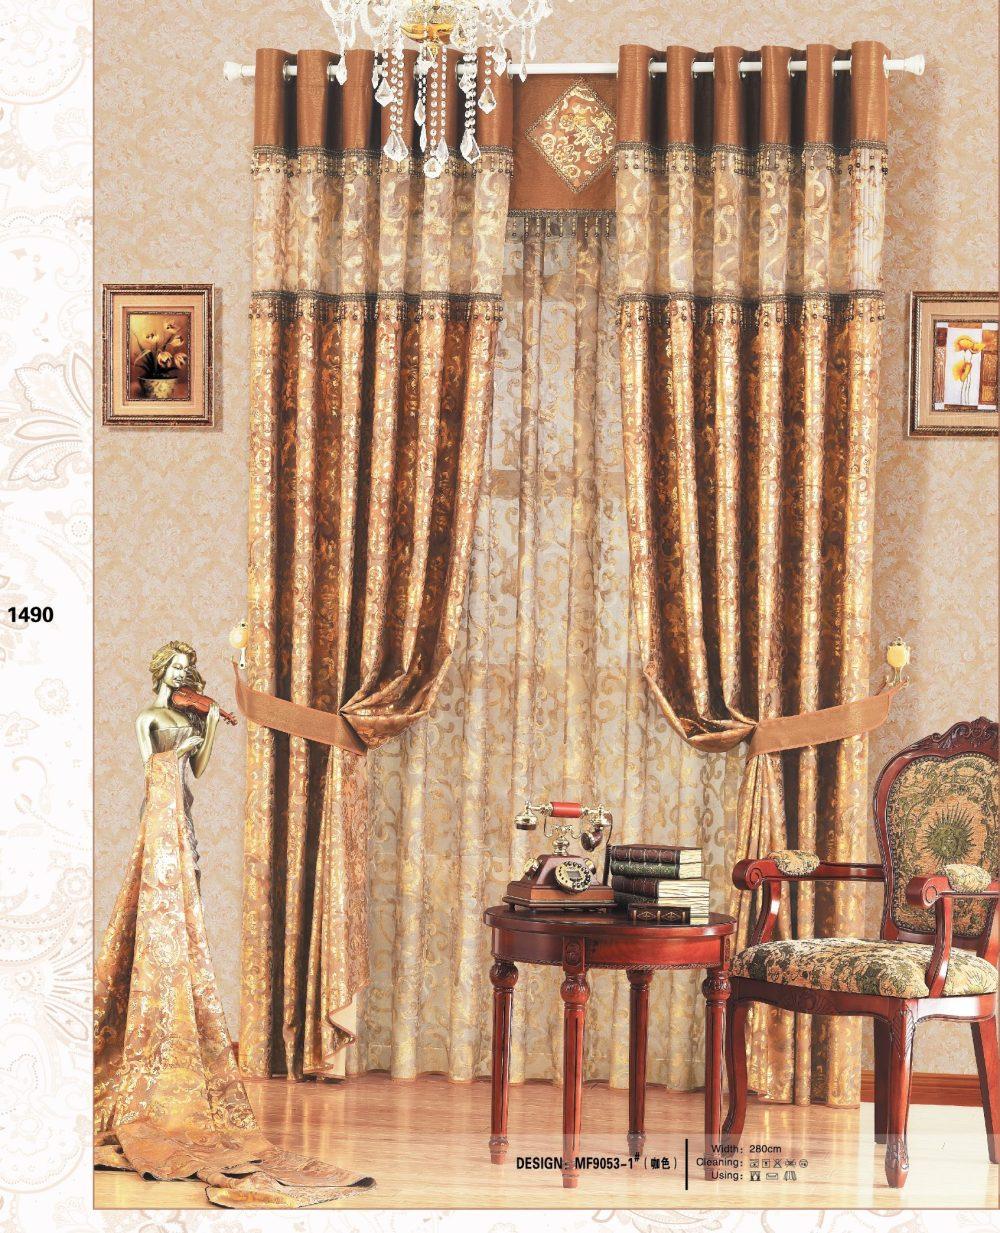 Aiden 收藏窗帘图片高清图(用方案里很清晰。)免费~_2.jpg